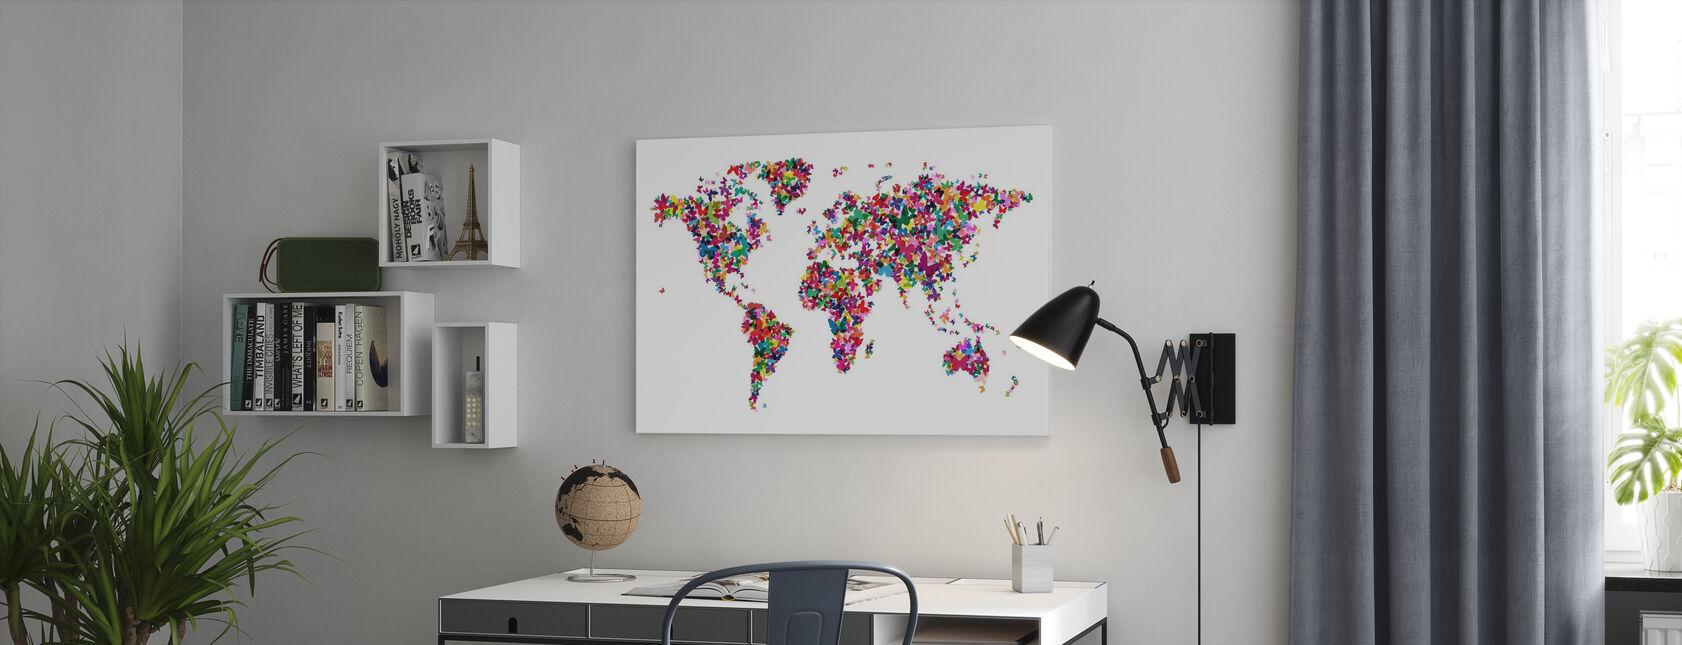 Butterflies World Map Multicolor - Canvas print - Office